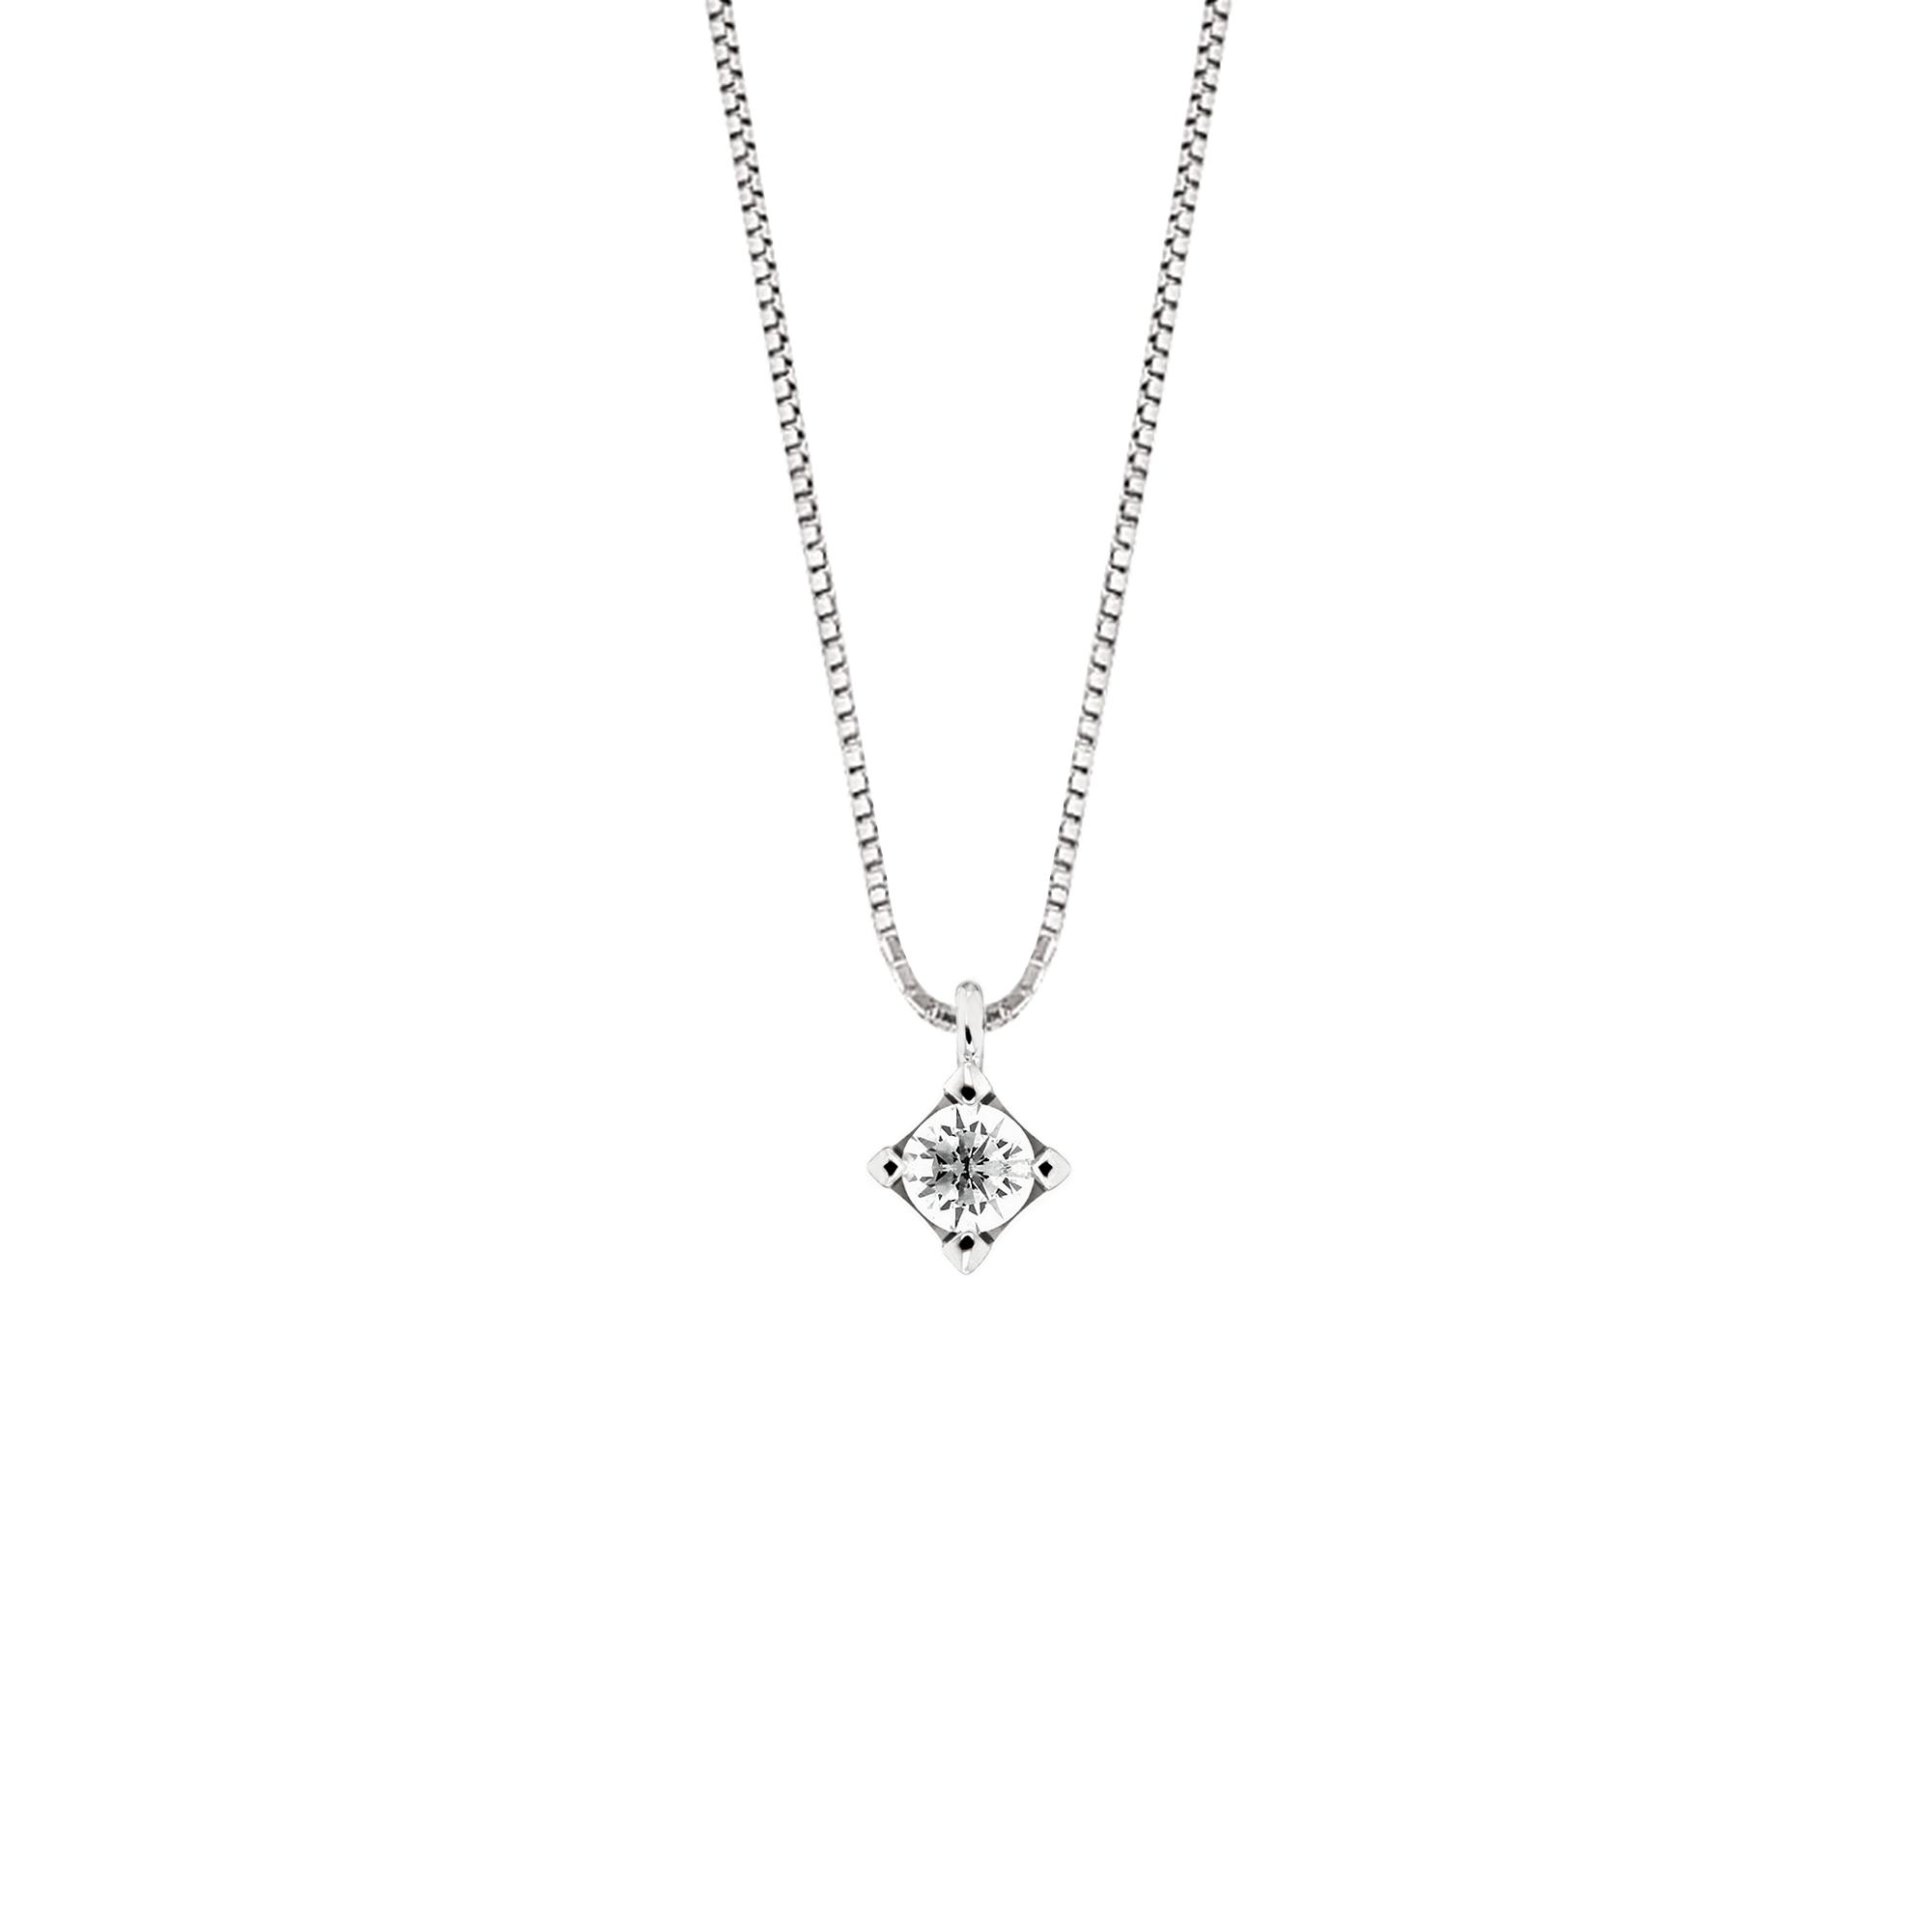 Lantisor din aur 18K cu pandantiv  cu diamant 0,05 ct., model Orsini CI1393-05